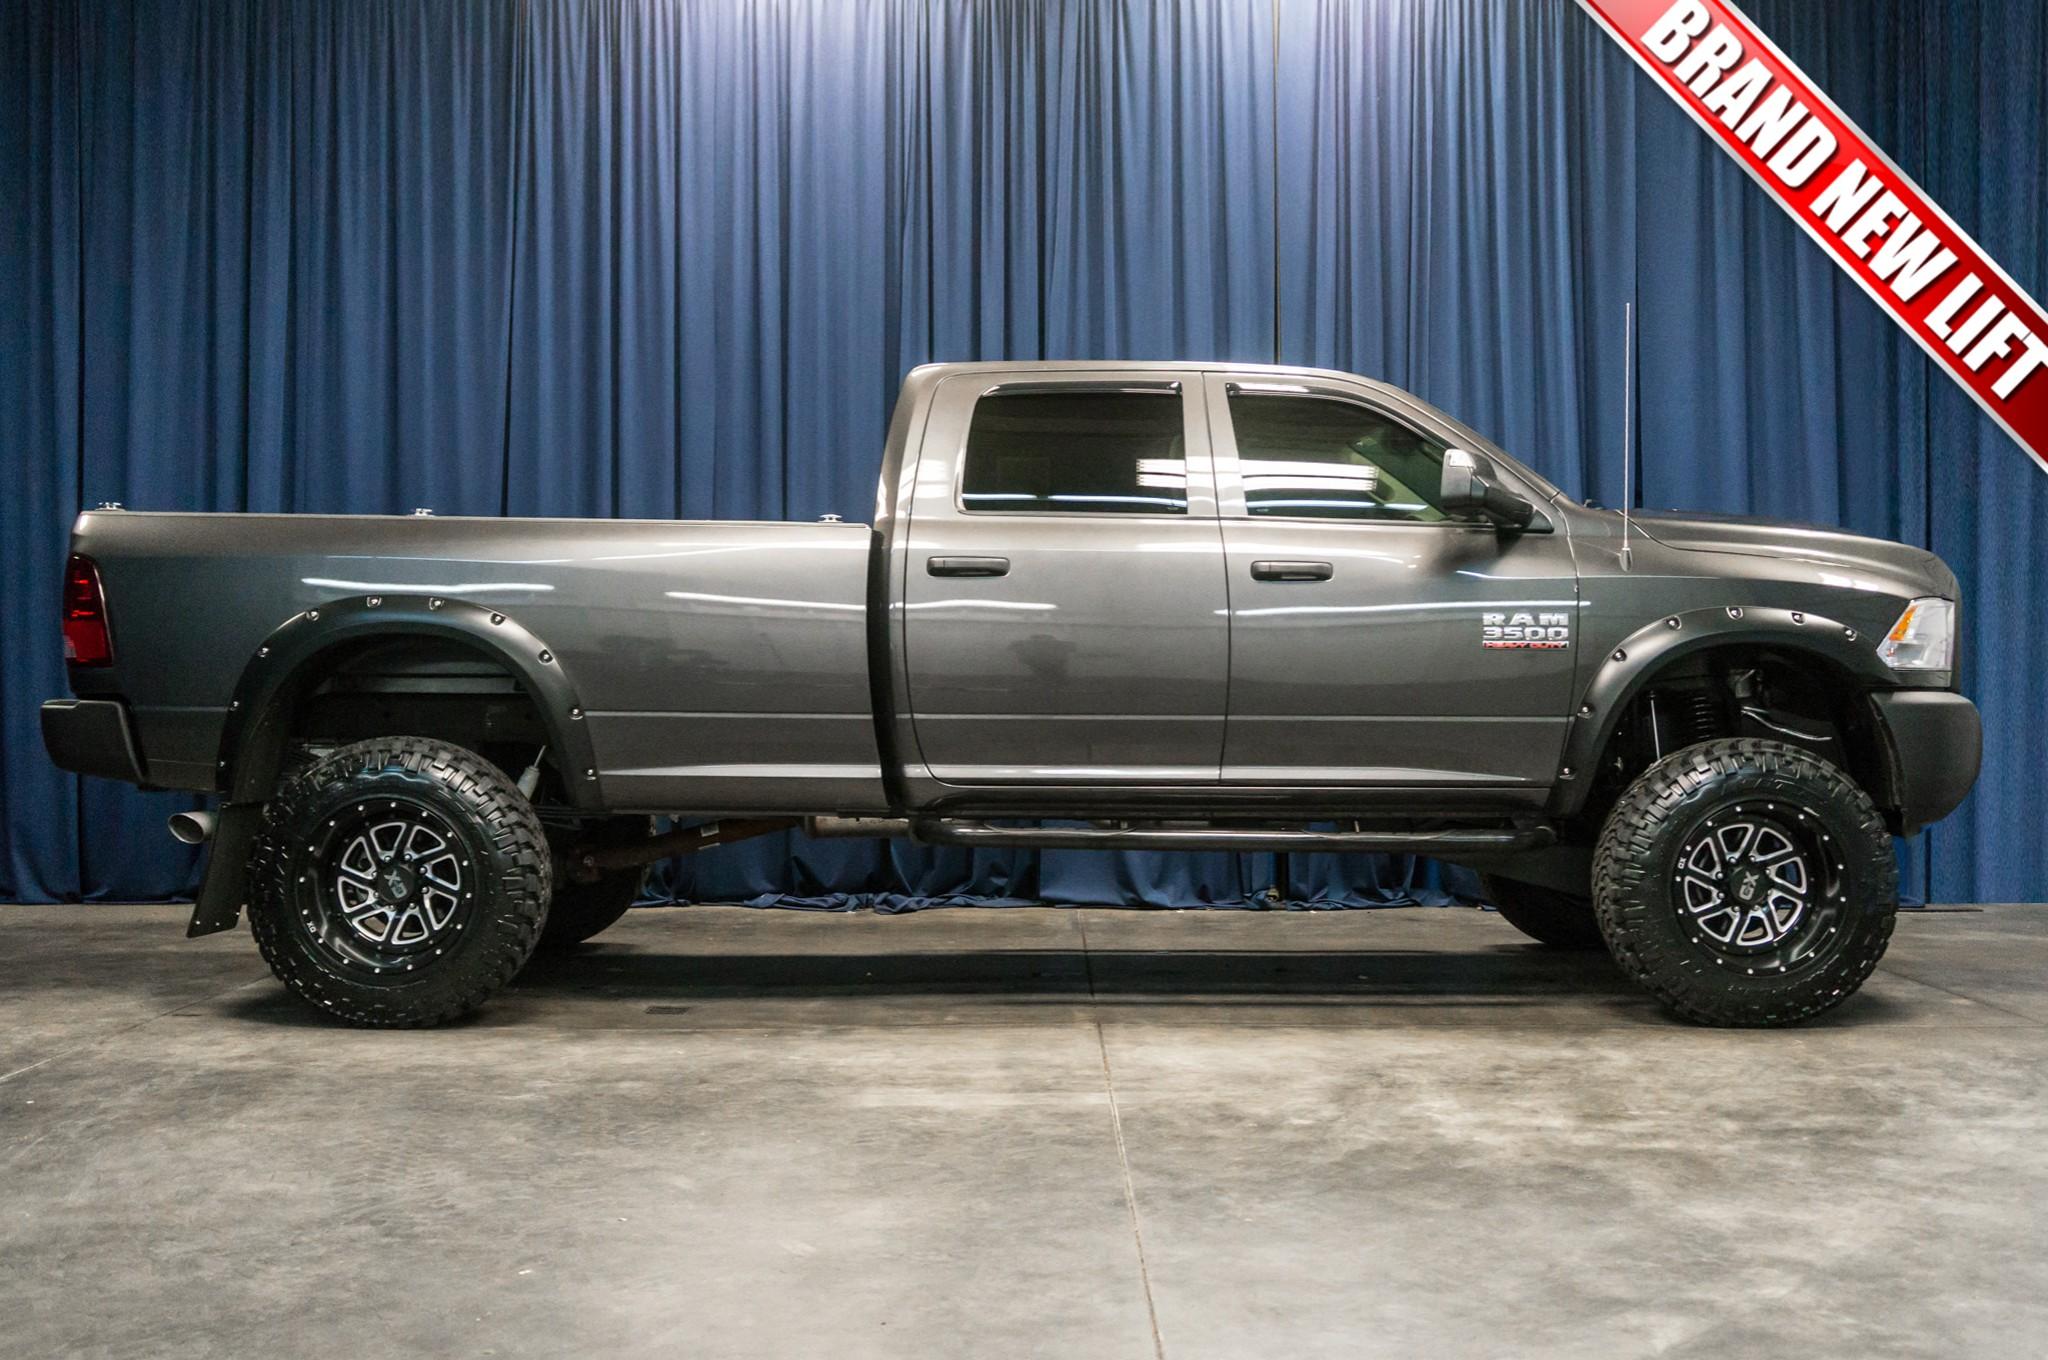 used lifted 2014 dodge ram 3500 4x4 diesel truck for sale 41100. Black Bedroom Furniture Sets. Home Design Ideas